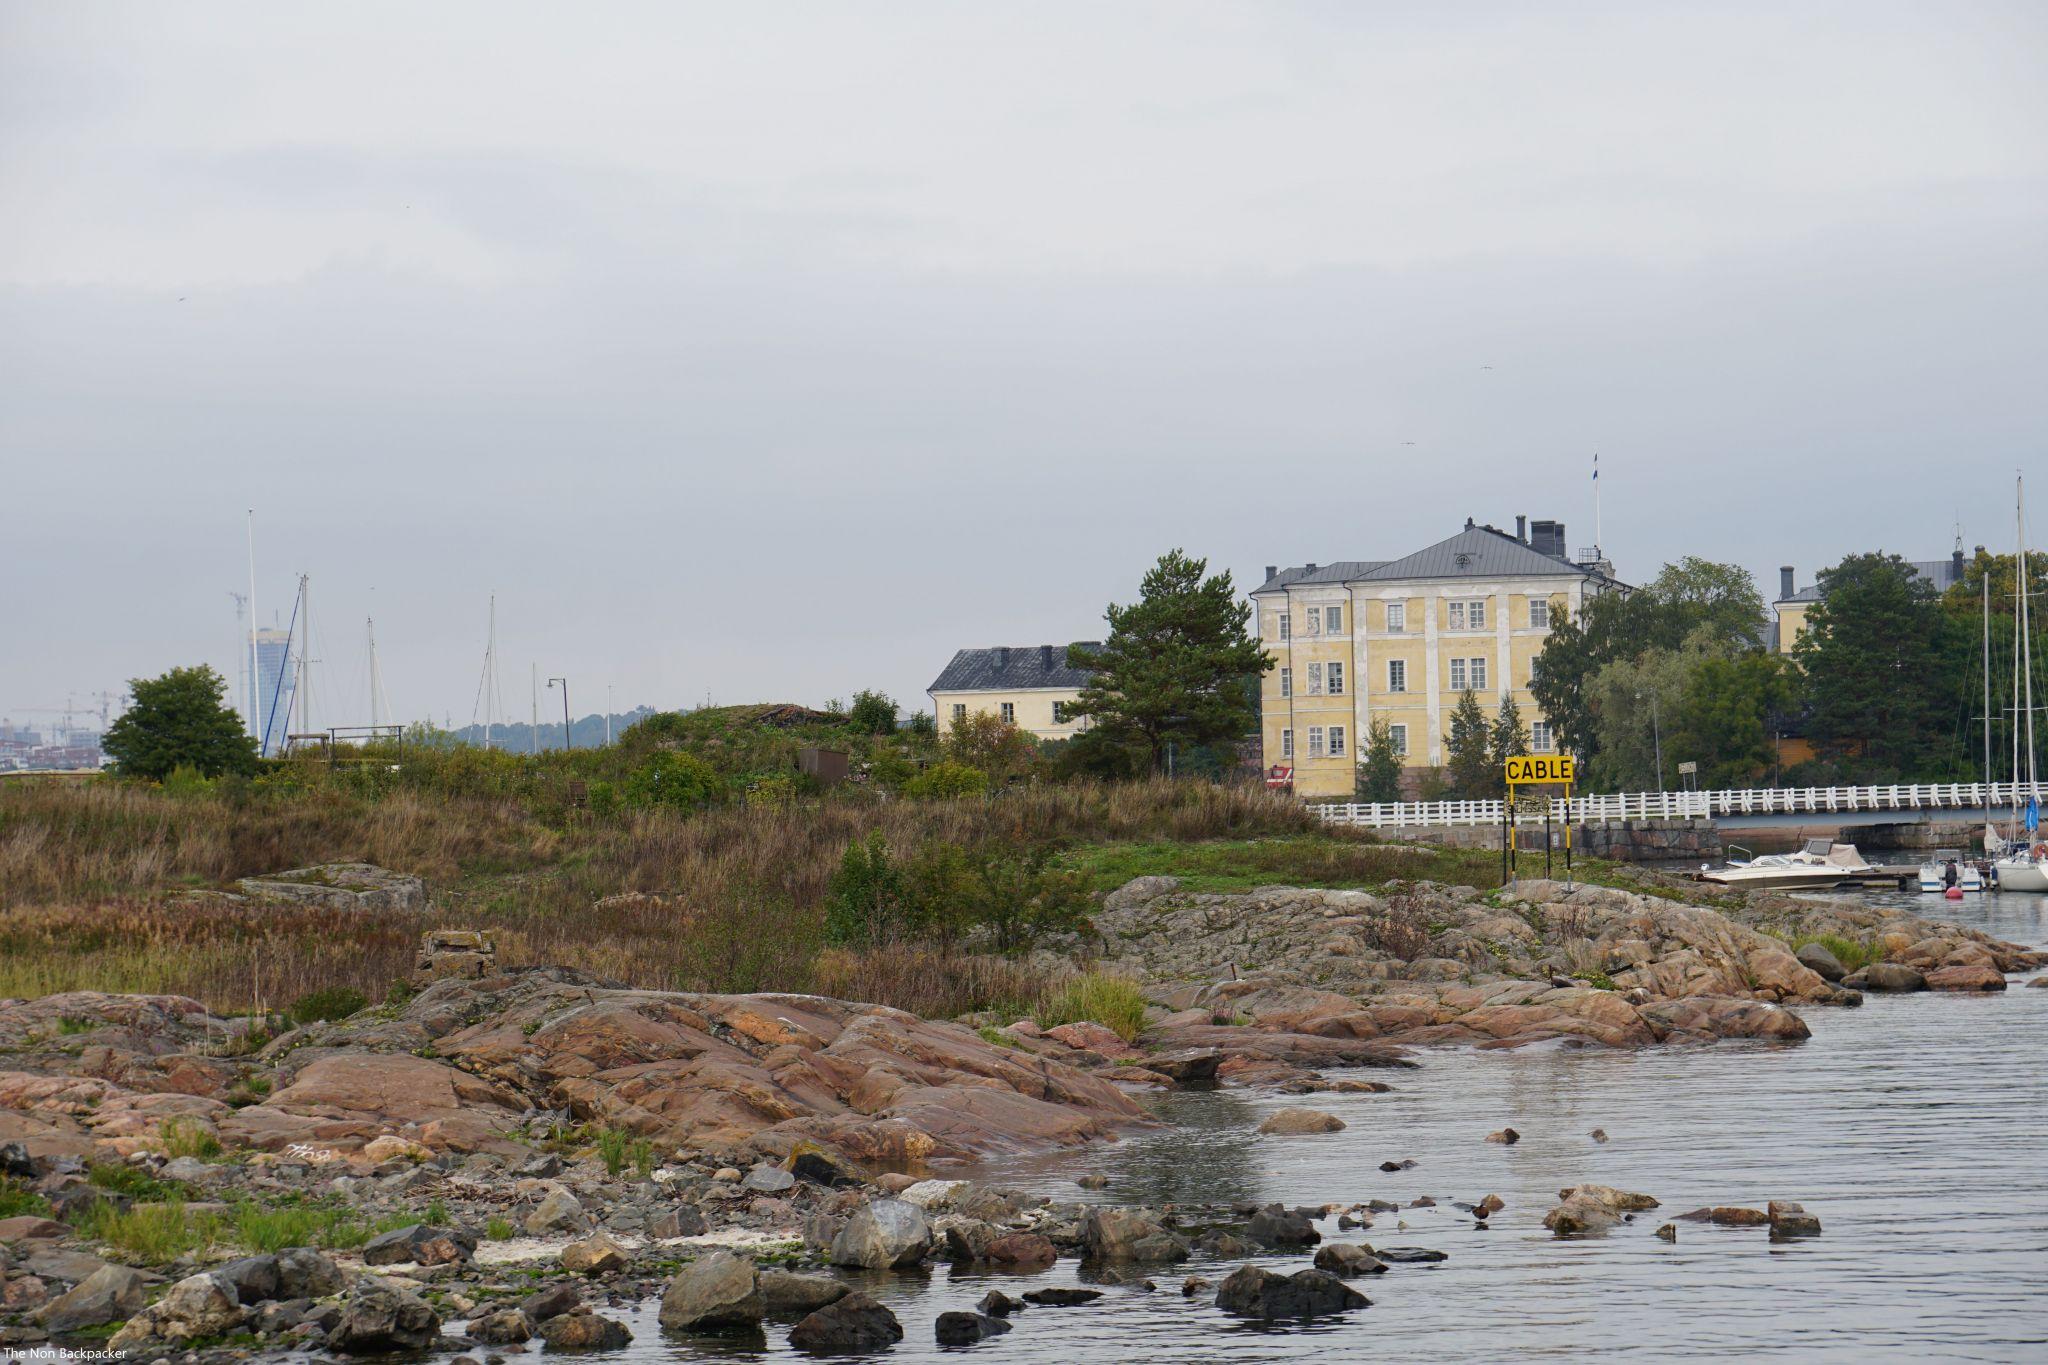 Islands in the harbour Helsinki